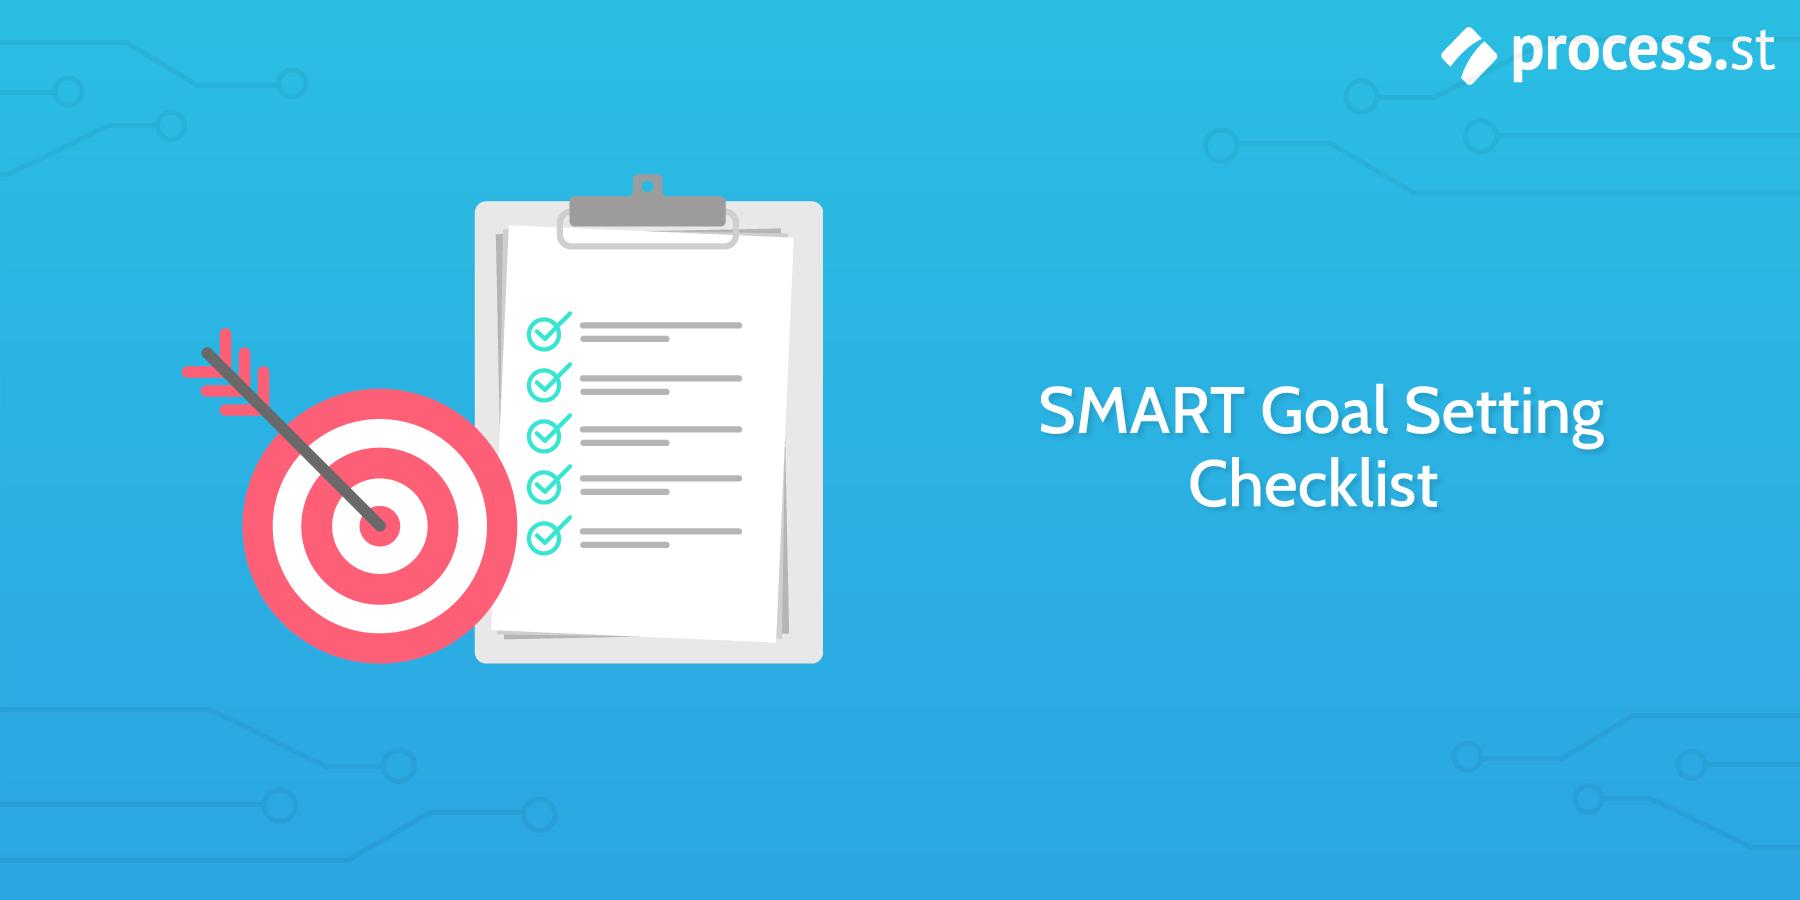 Smart Goal Setting Checklist